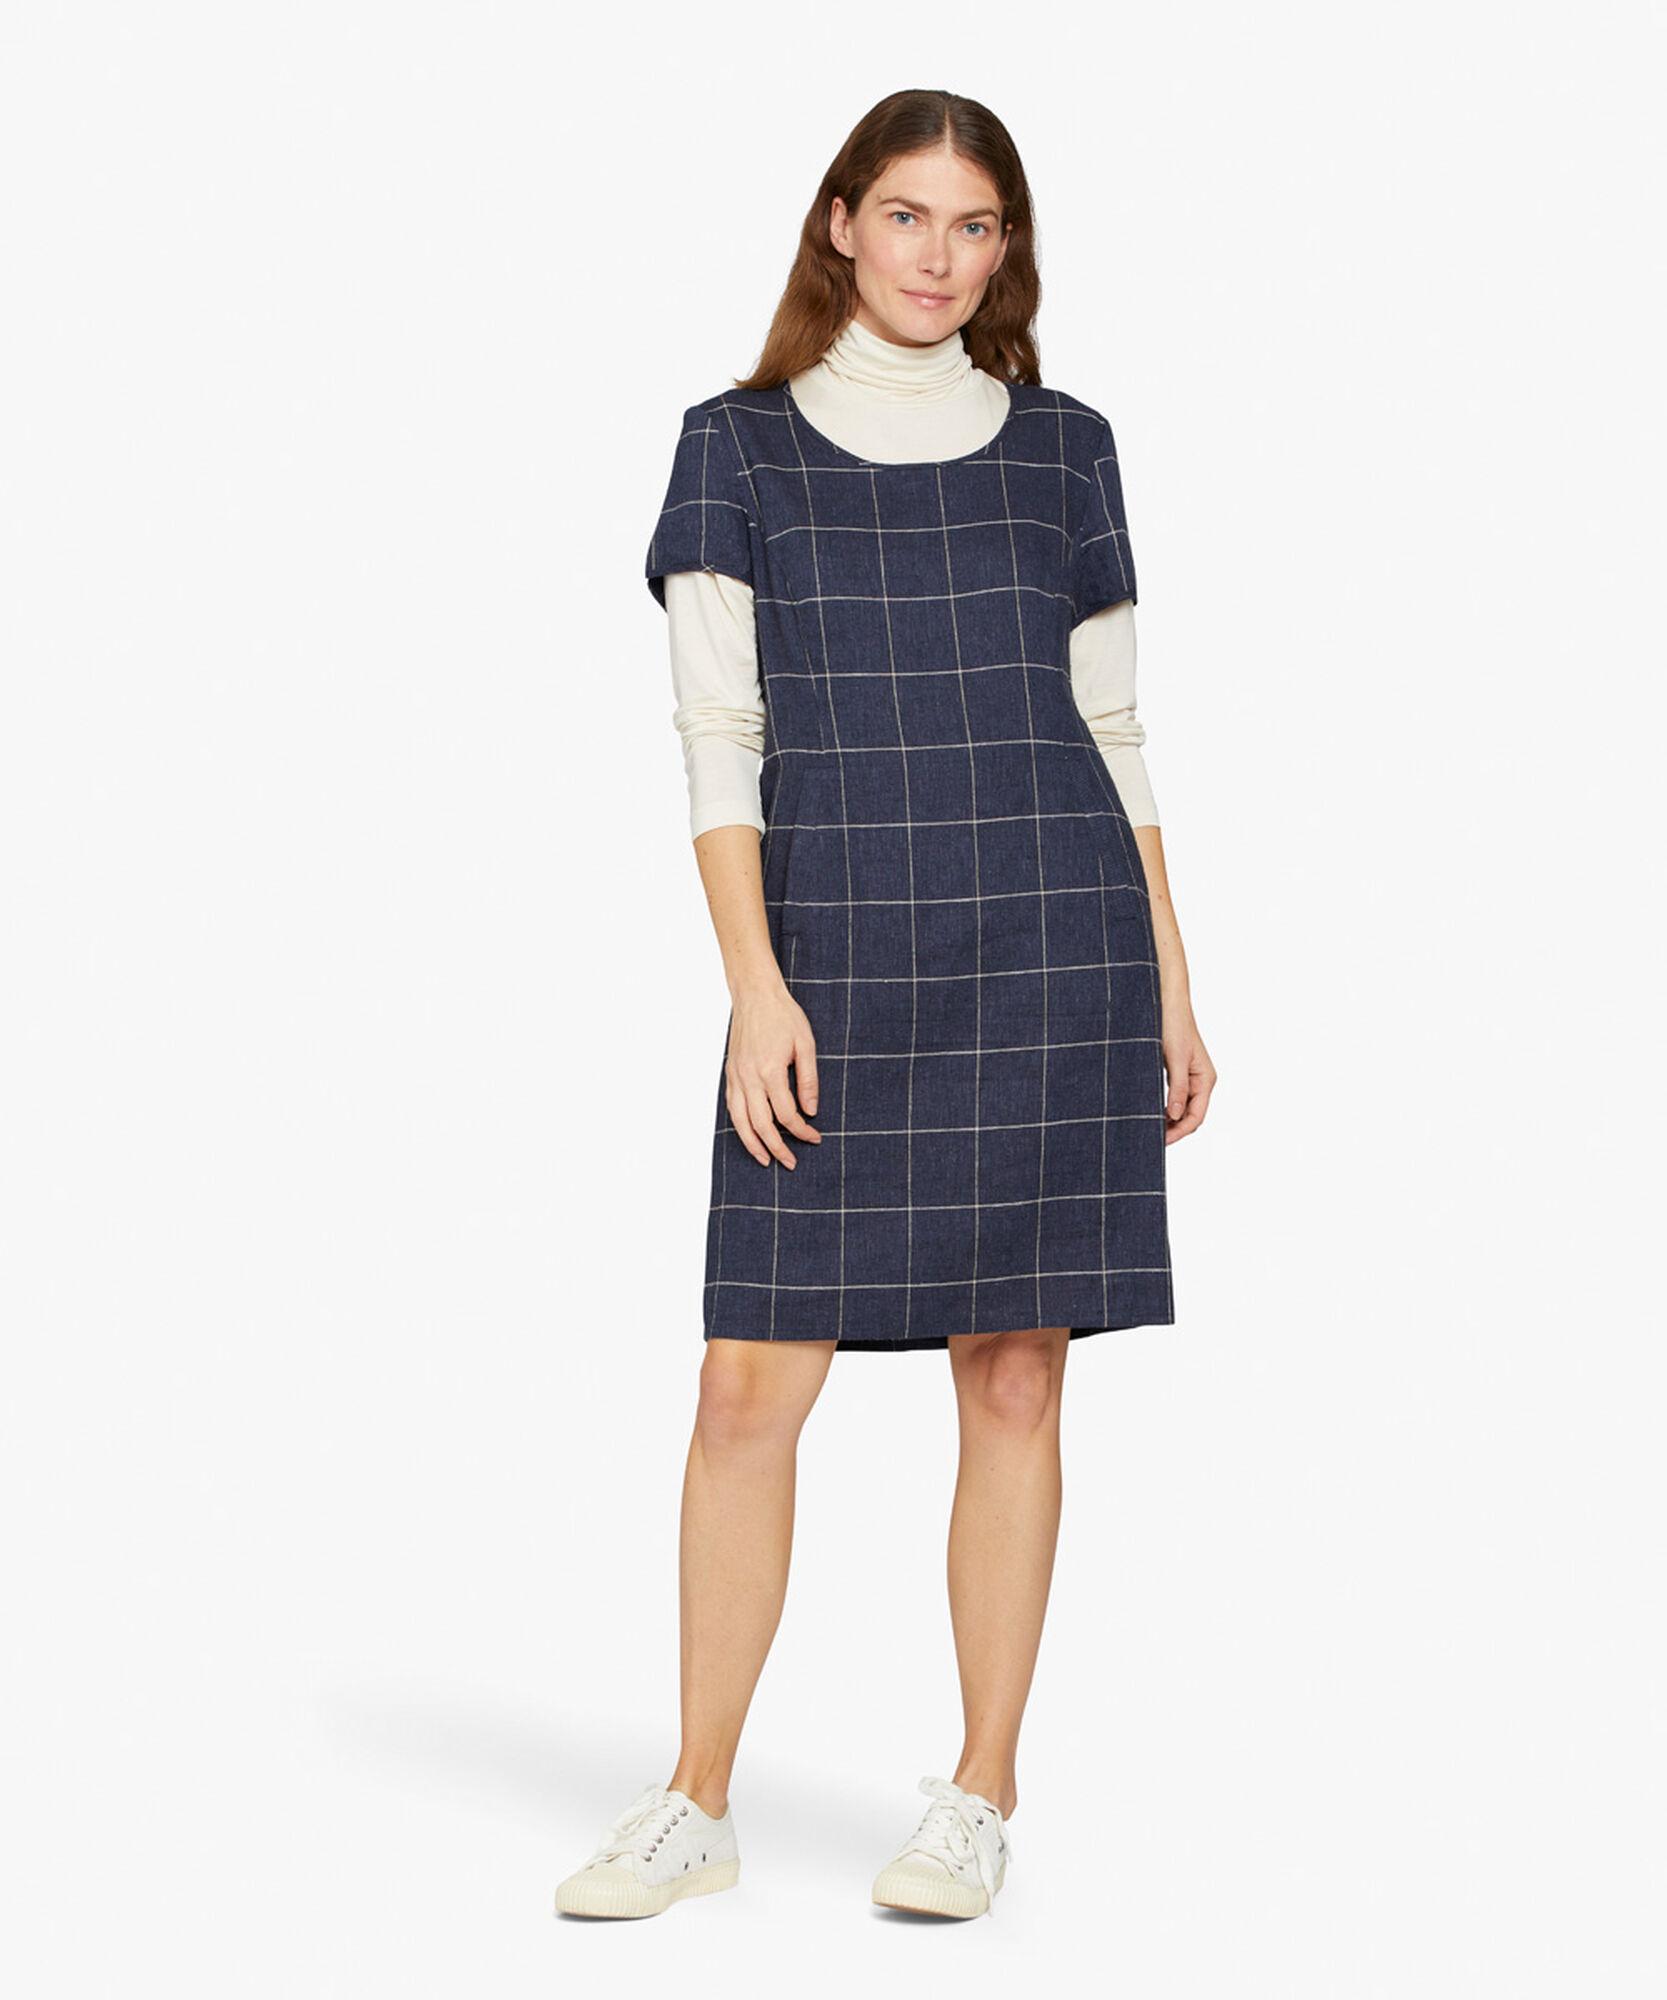 NABLA DRESS, Navy, hi-res